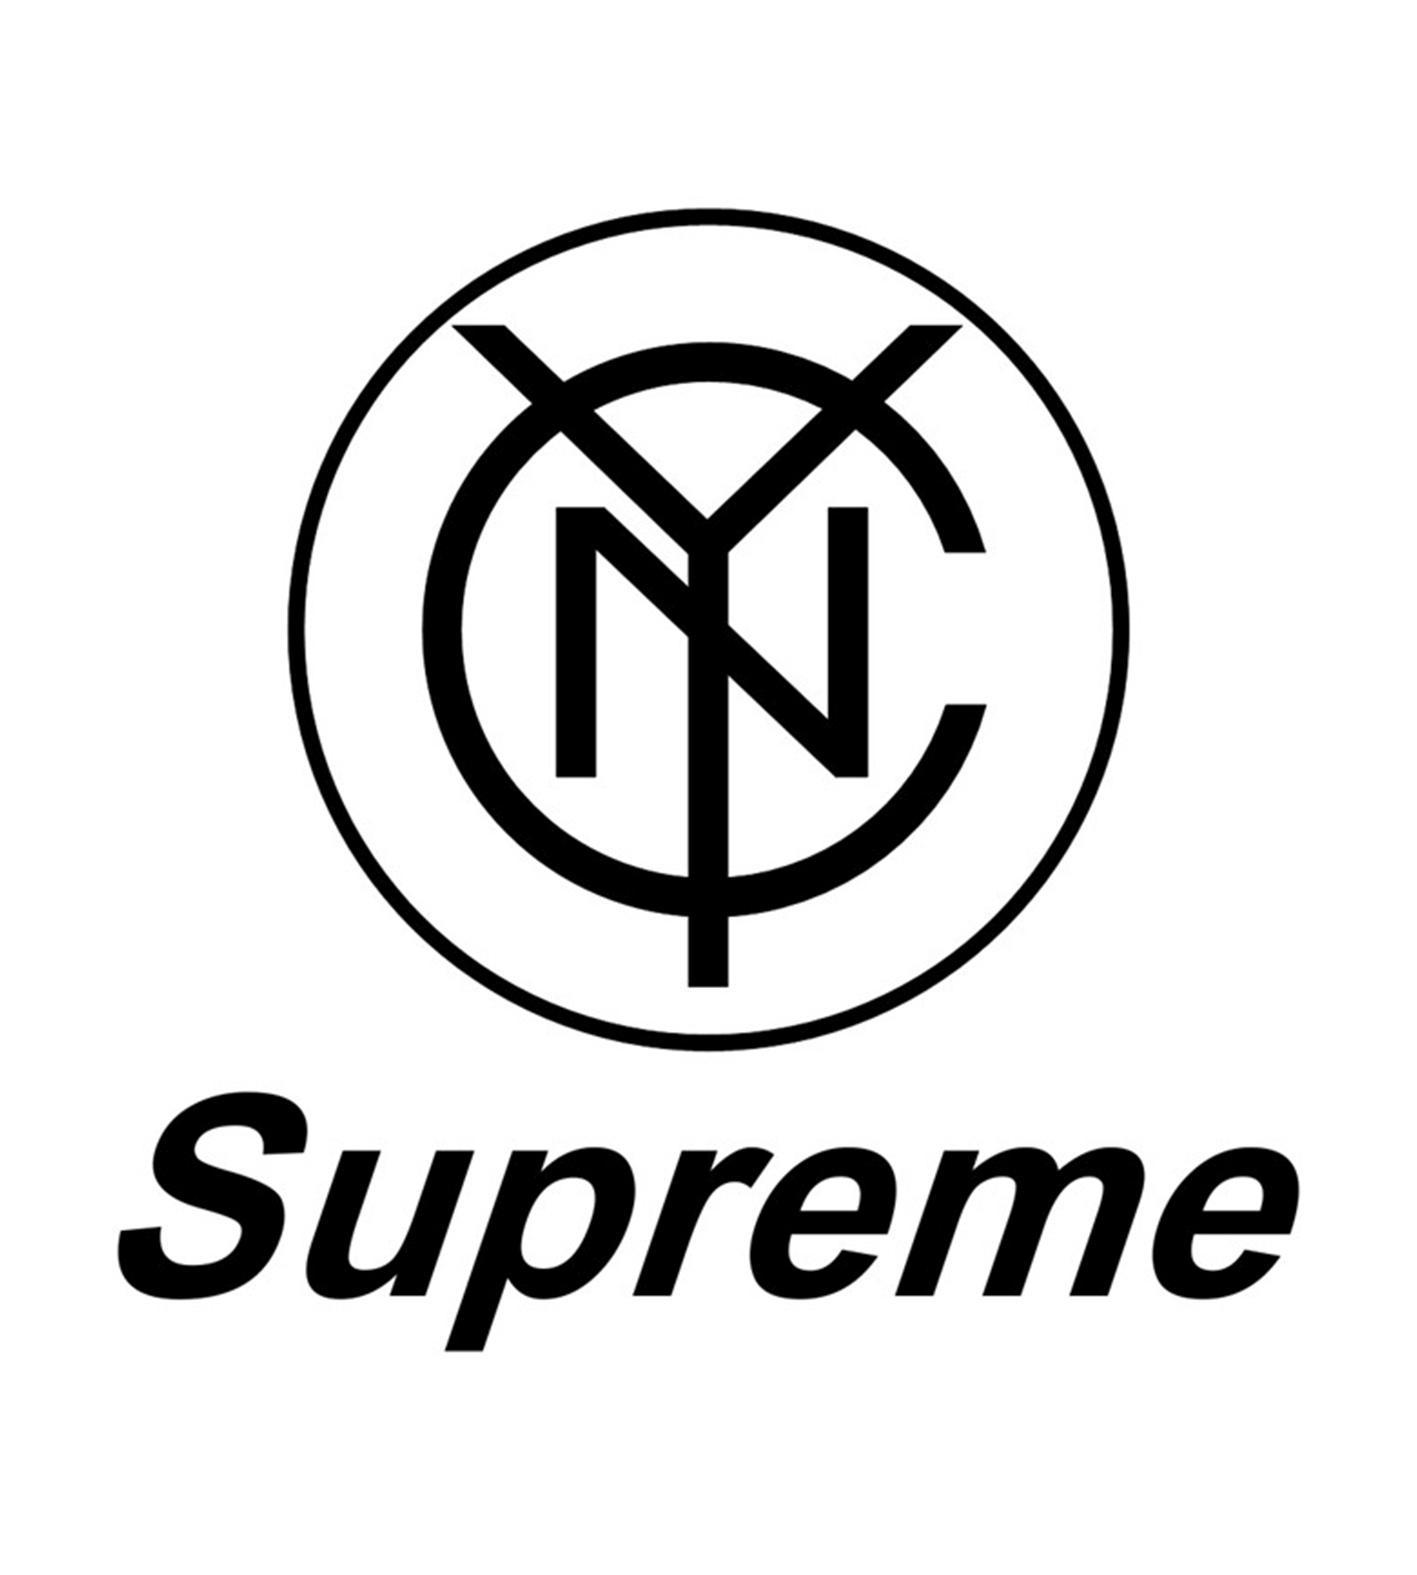 logo logo 标志 设计 图标 1417_1575